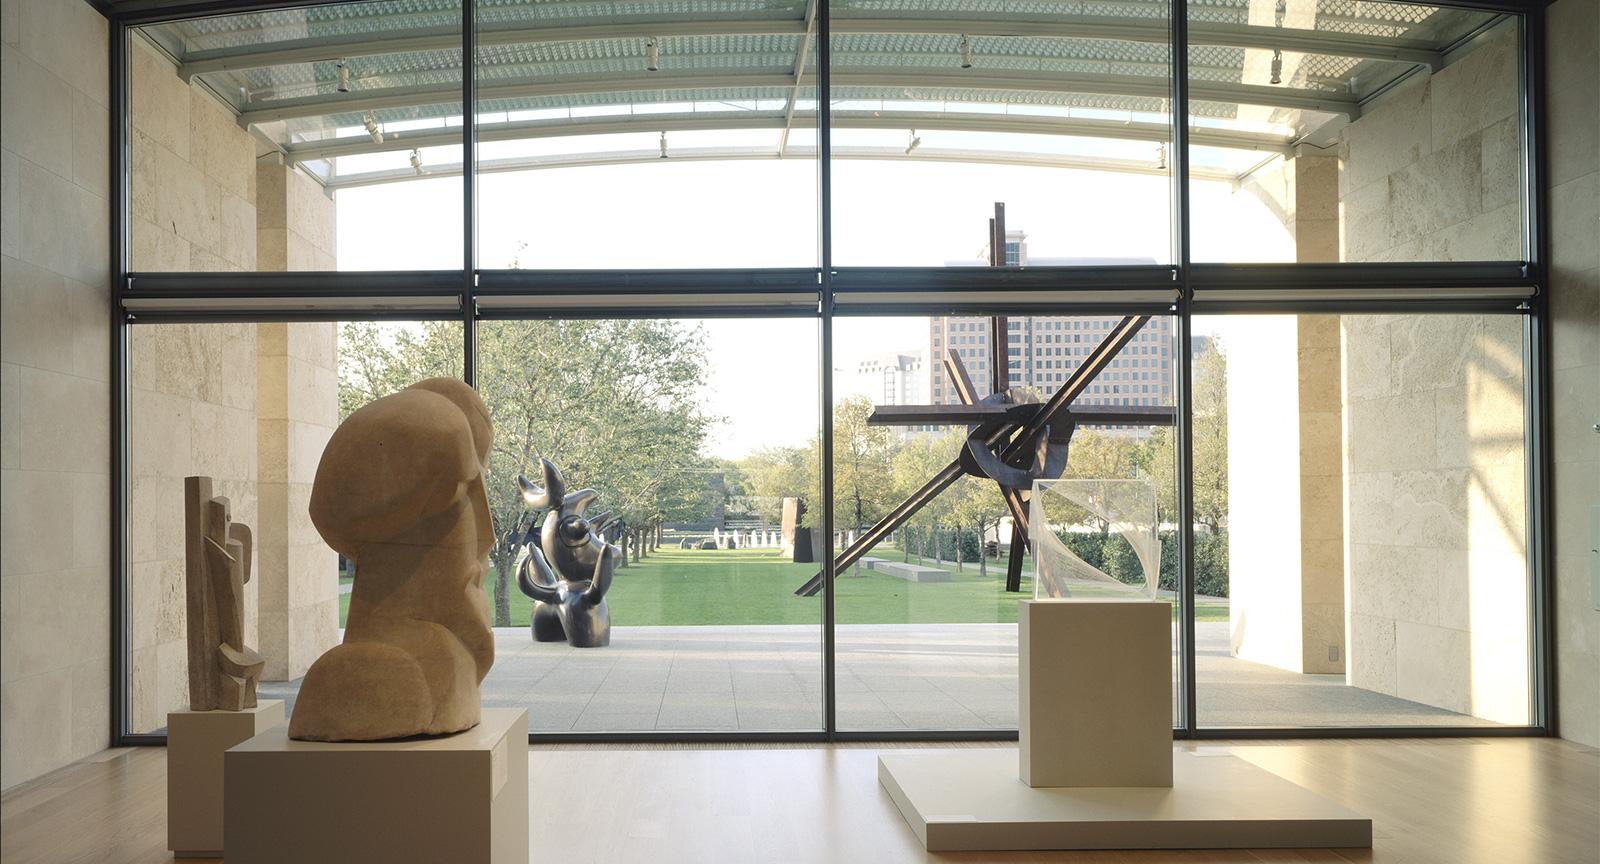 Dallas Arts District Visual Arts Nasher